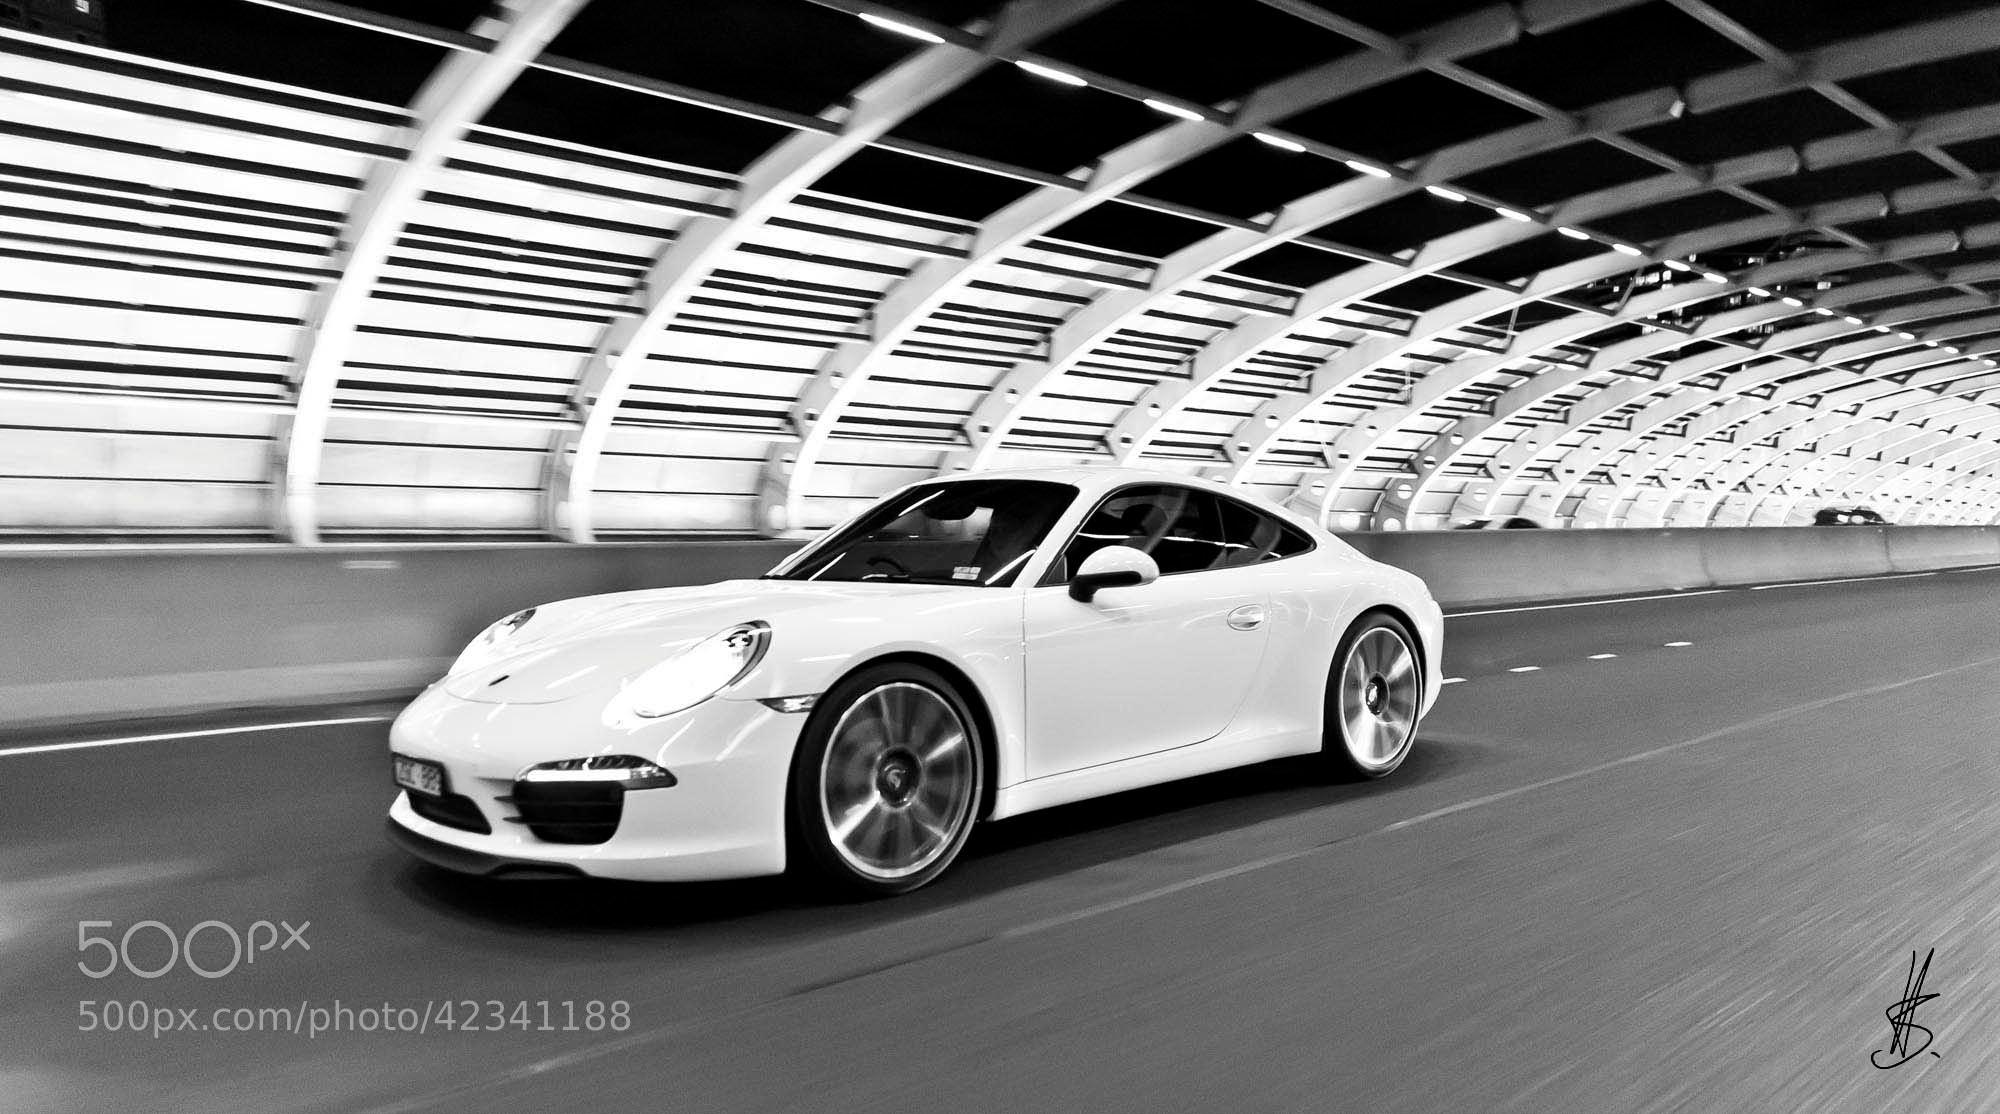 Photograph Porsche by Hilton Stone on 500px